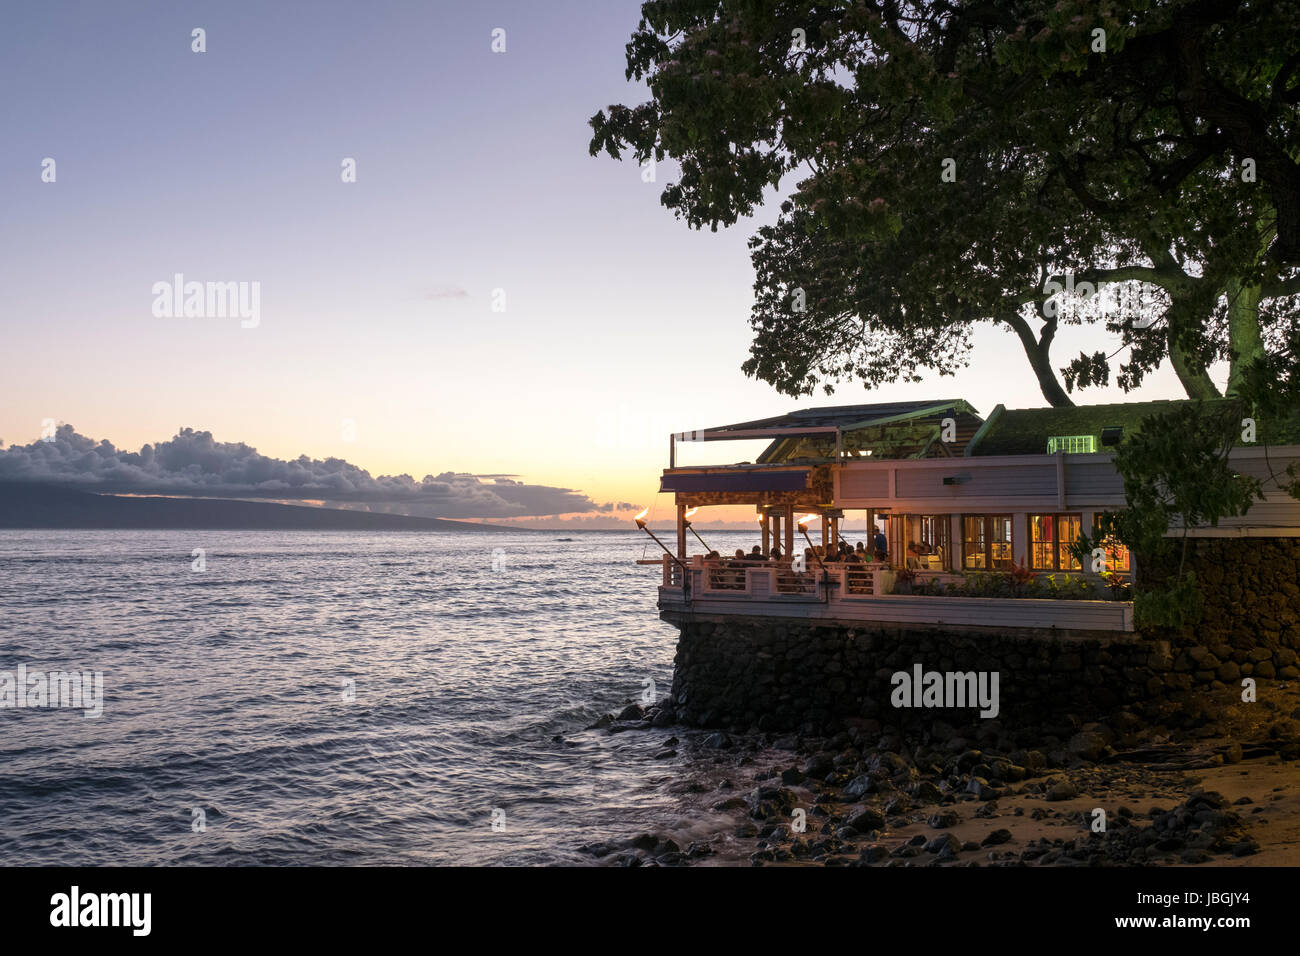 Tourists enjoying a sunset dinner in a restaurant on Front Street Lahaina Maui Hawaii Stock Photo